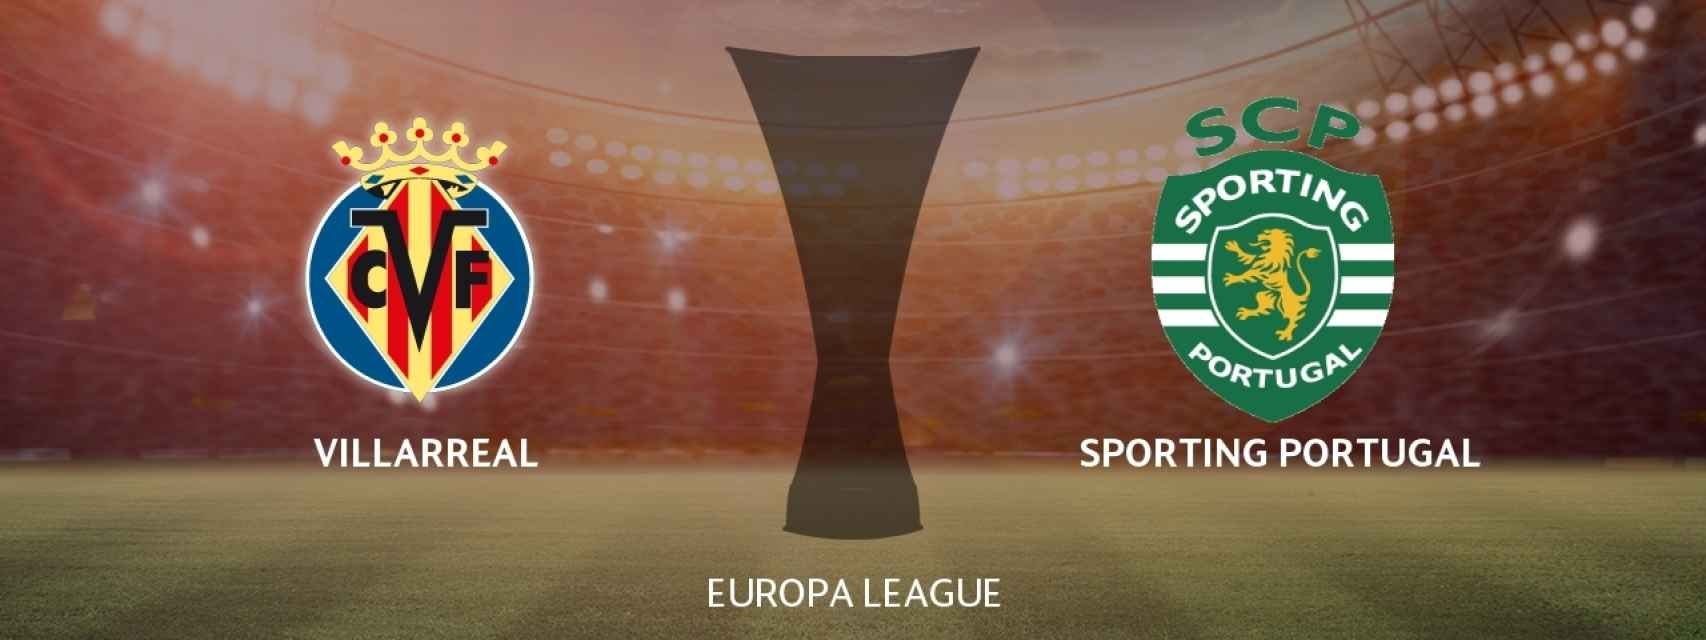 Villarreal - Sporting Portugal